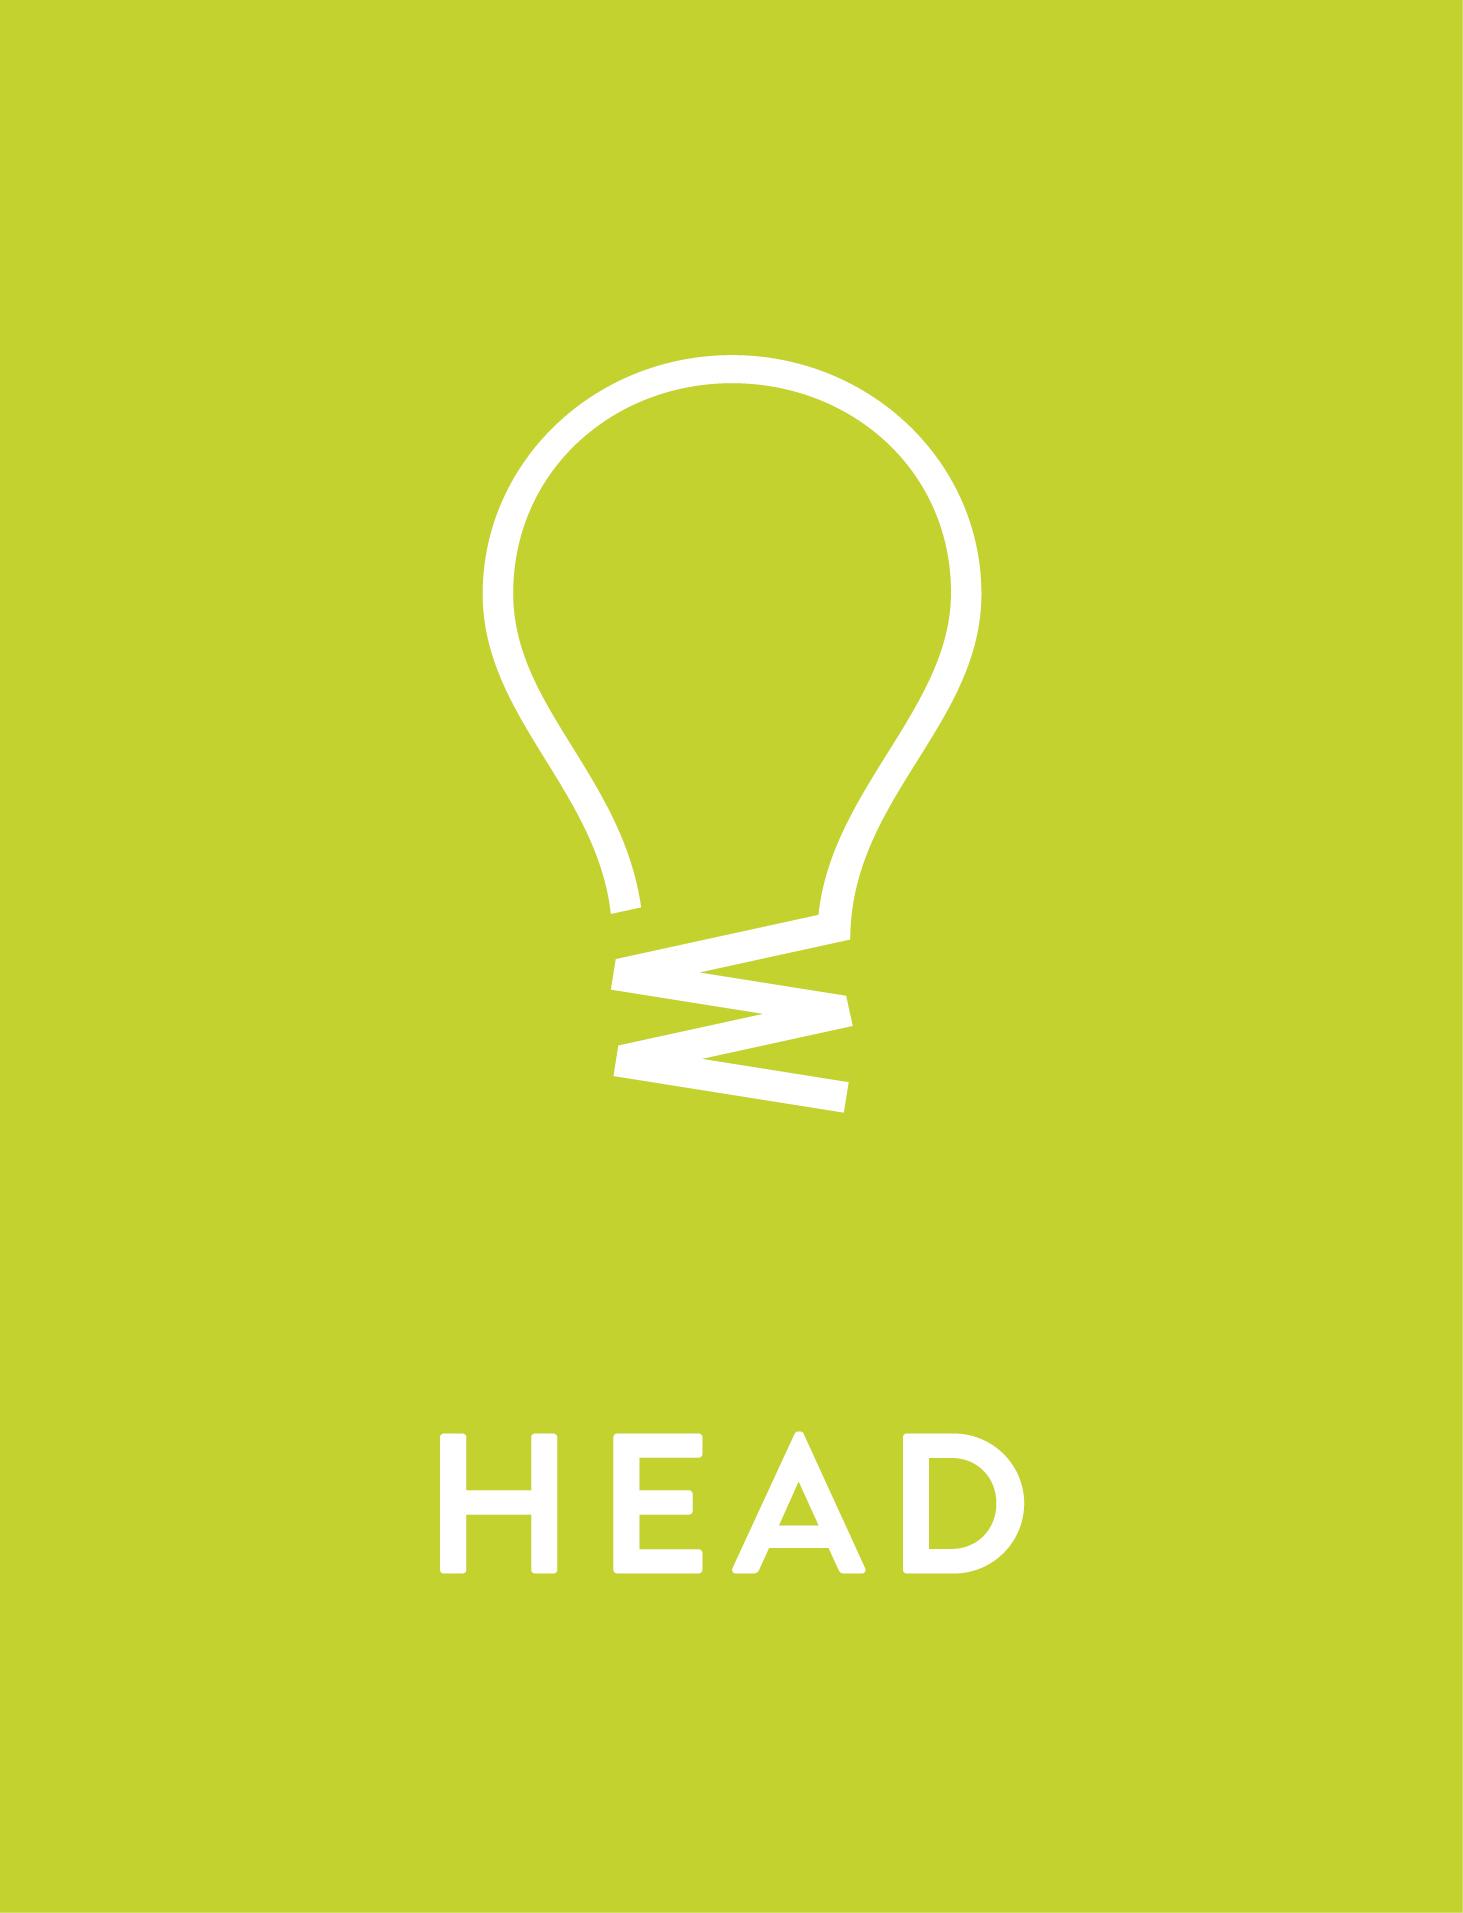 _4H_Icons_1_Head.jpg